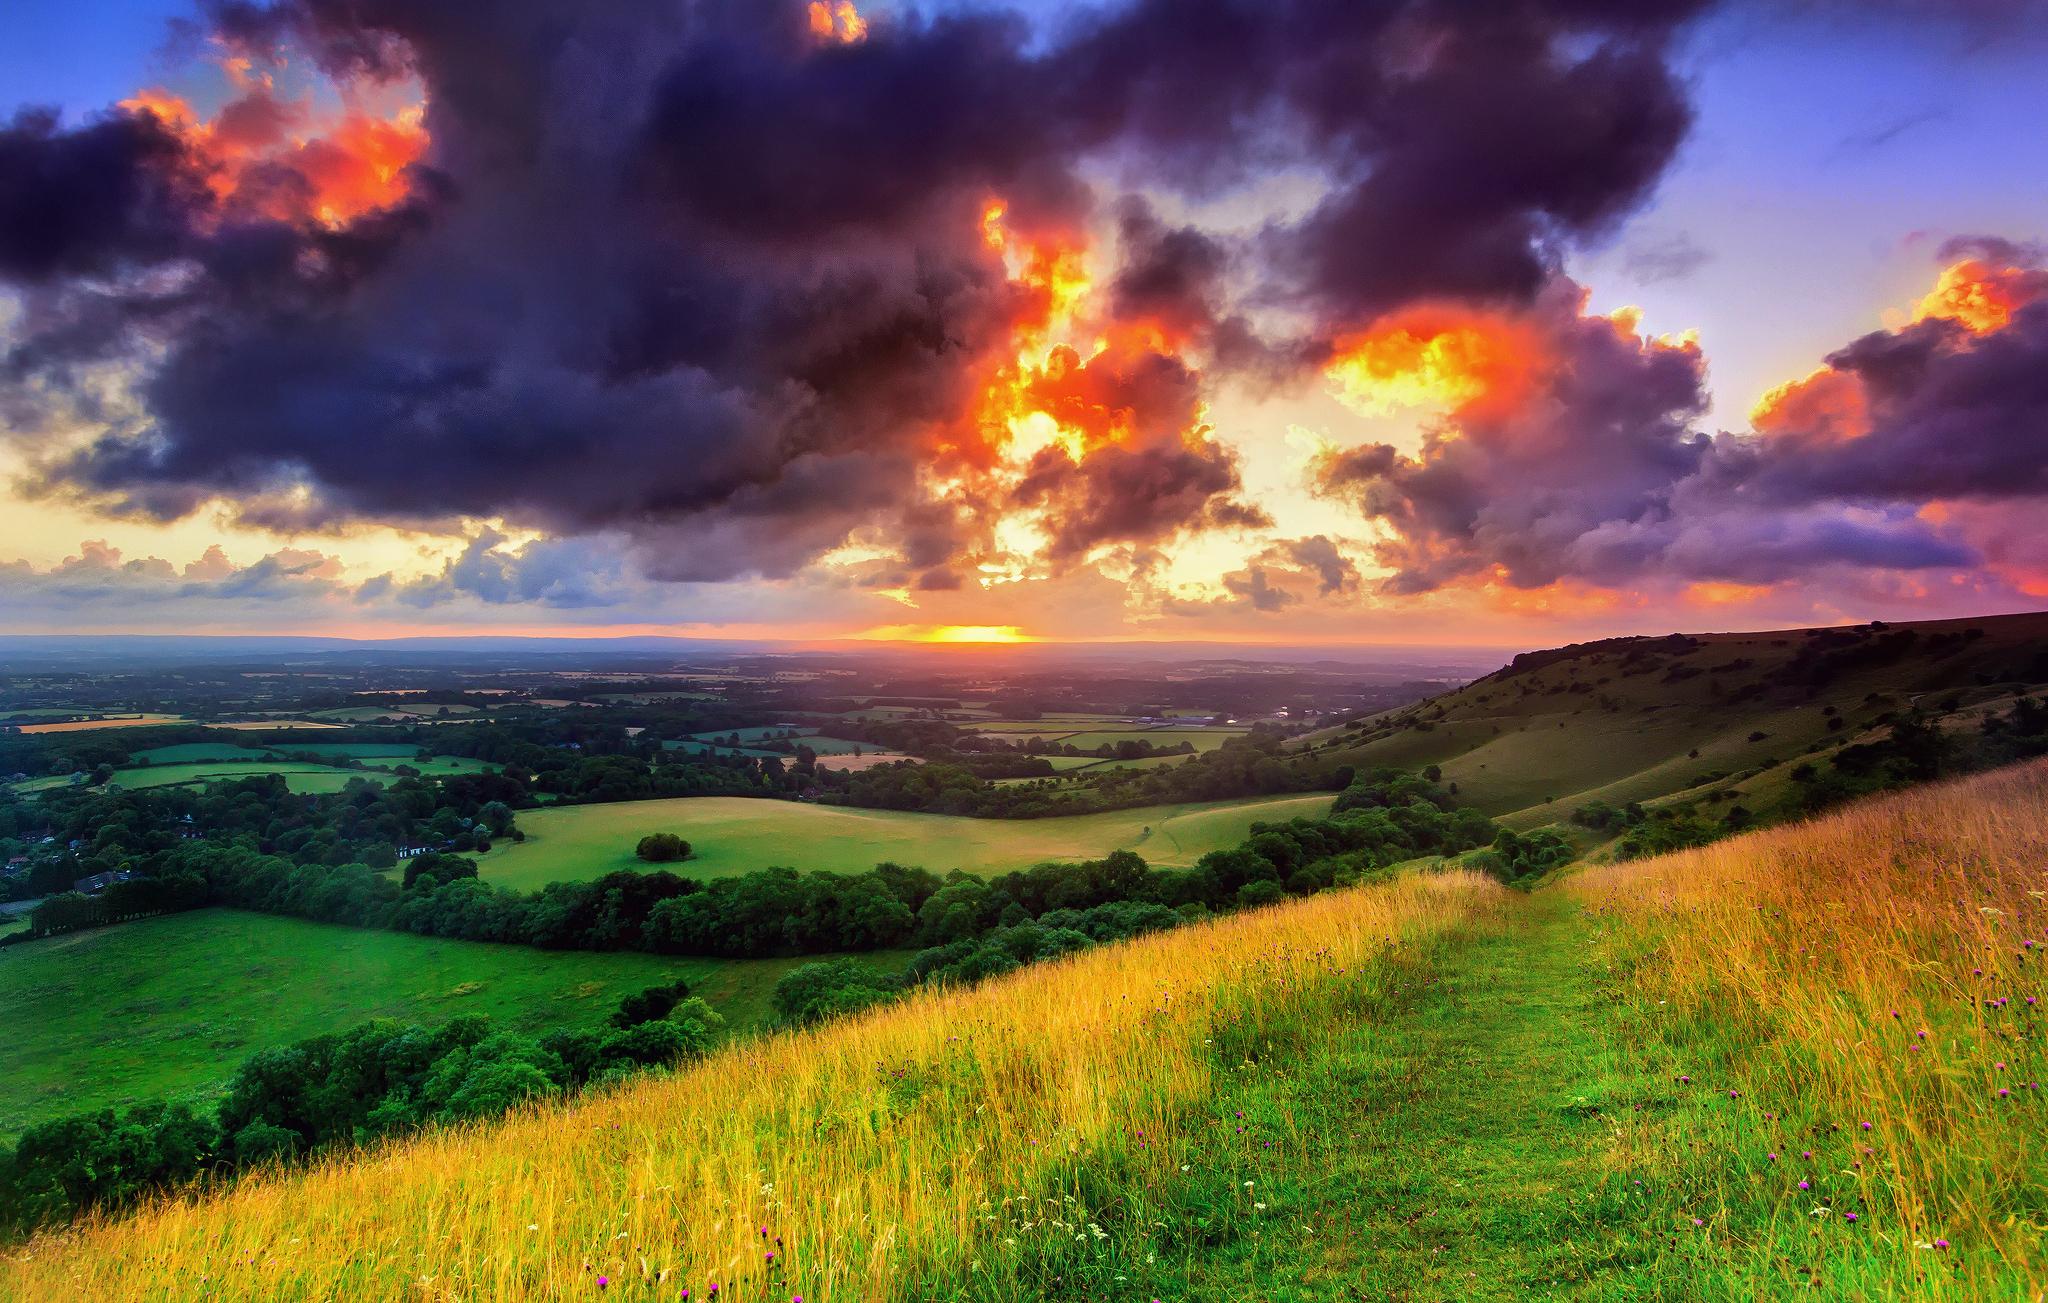 холмы небо солнце  № 2742552 бесплатно